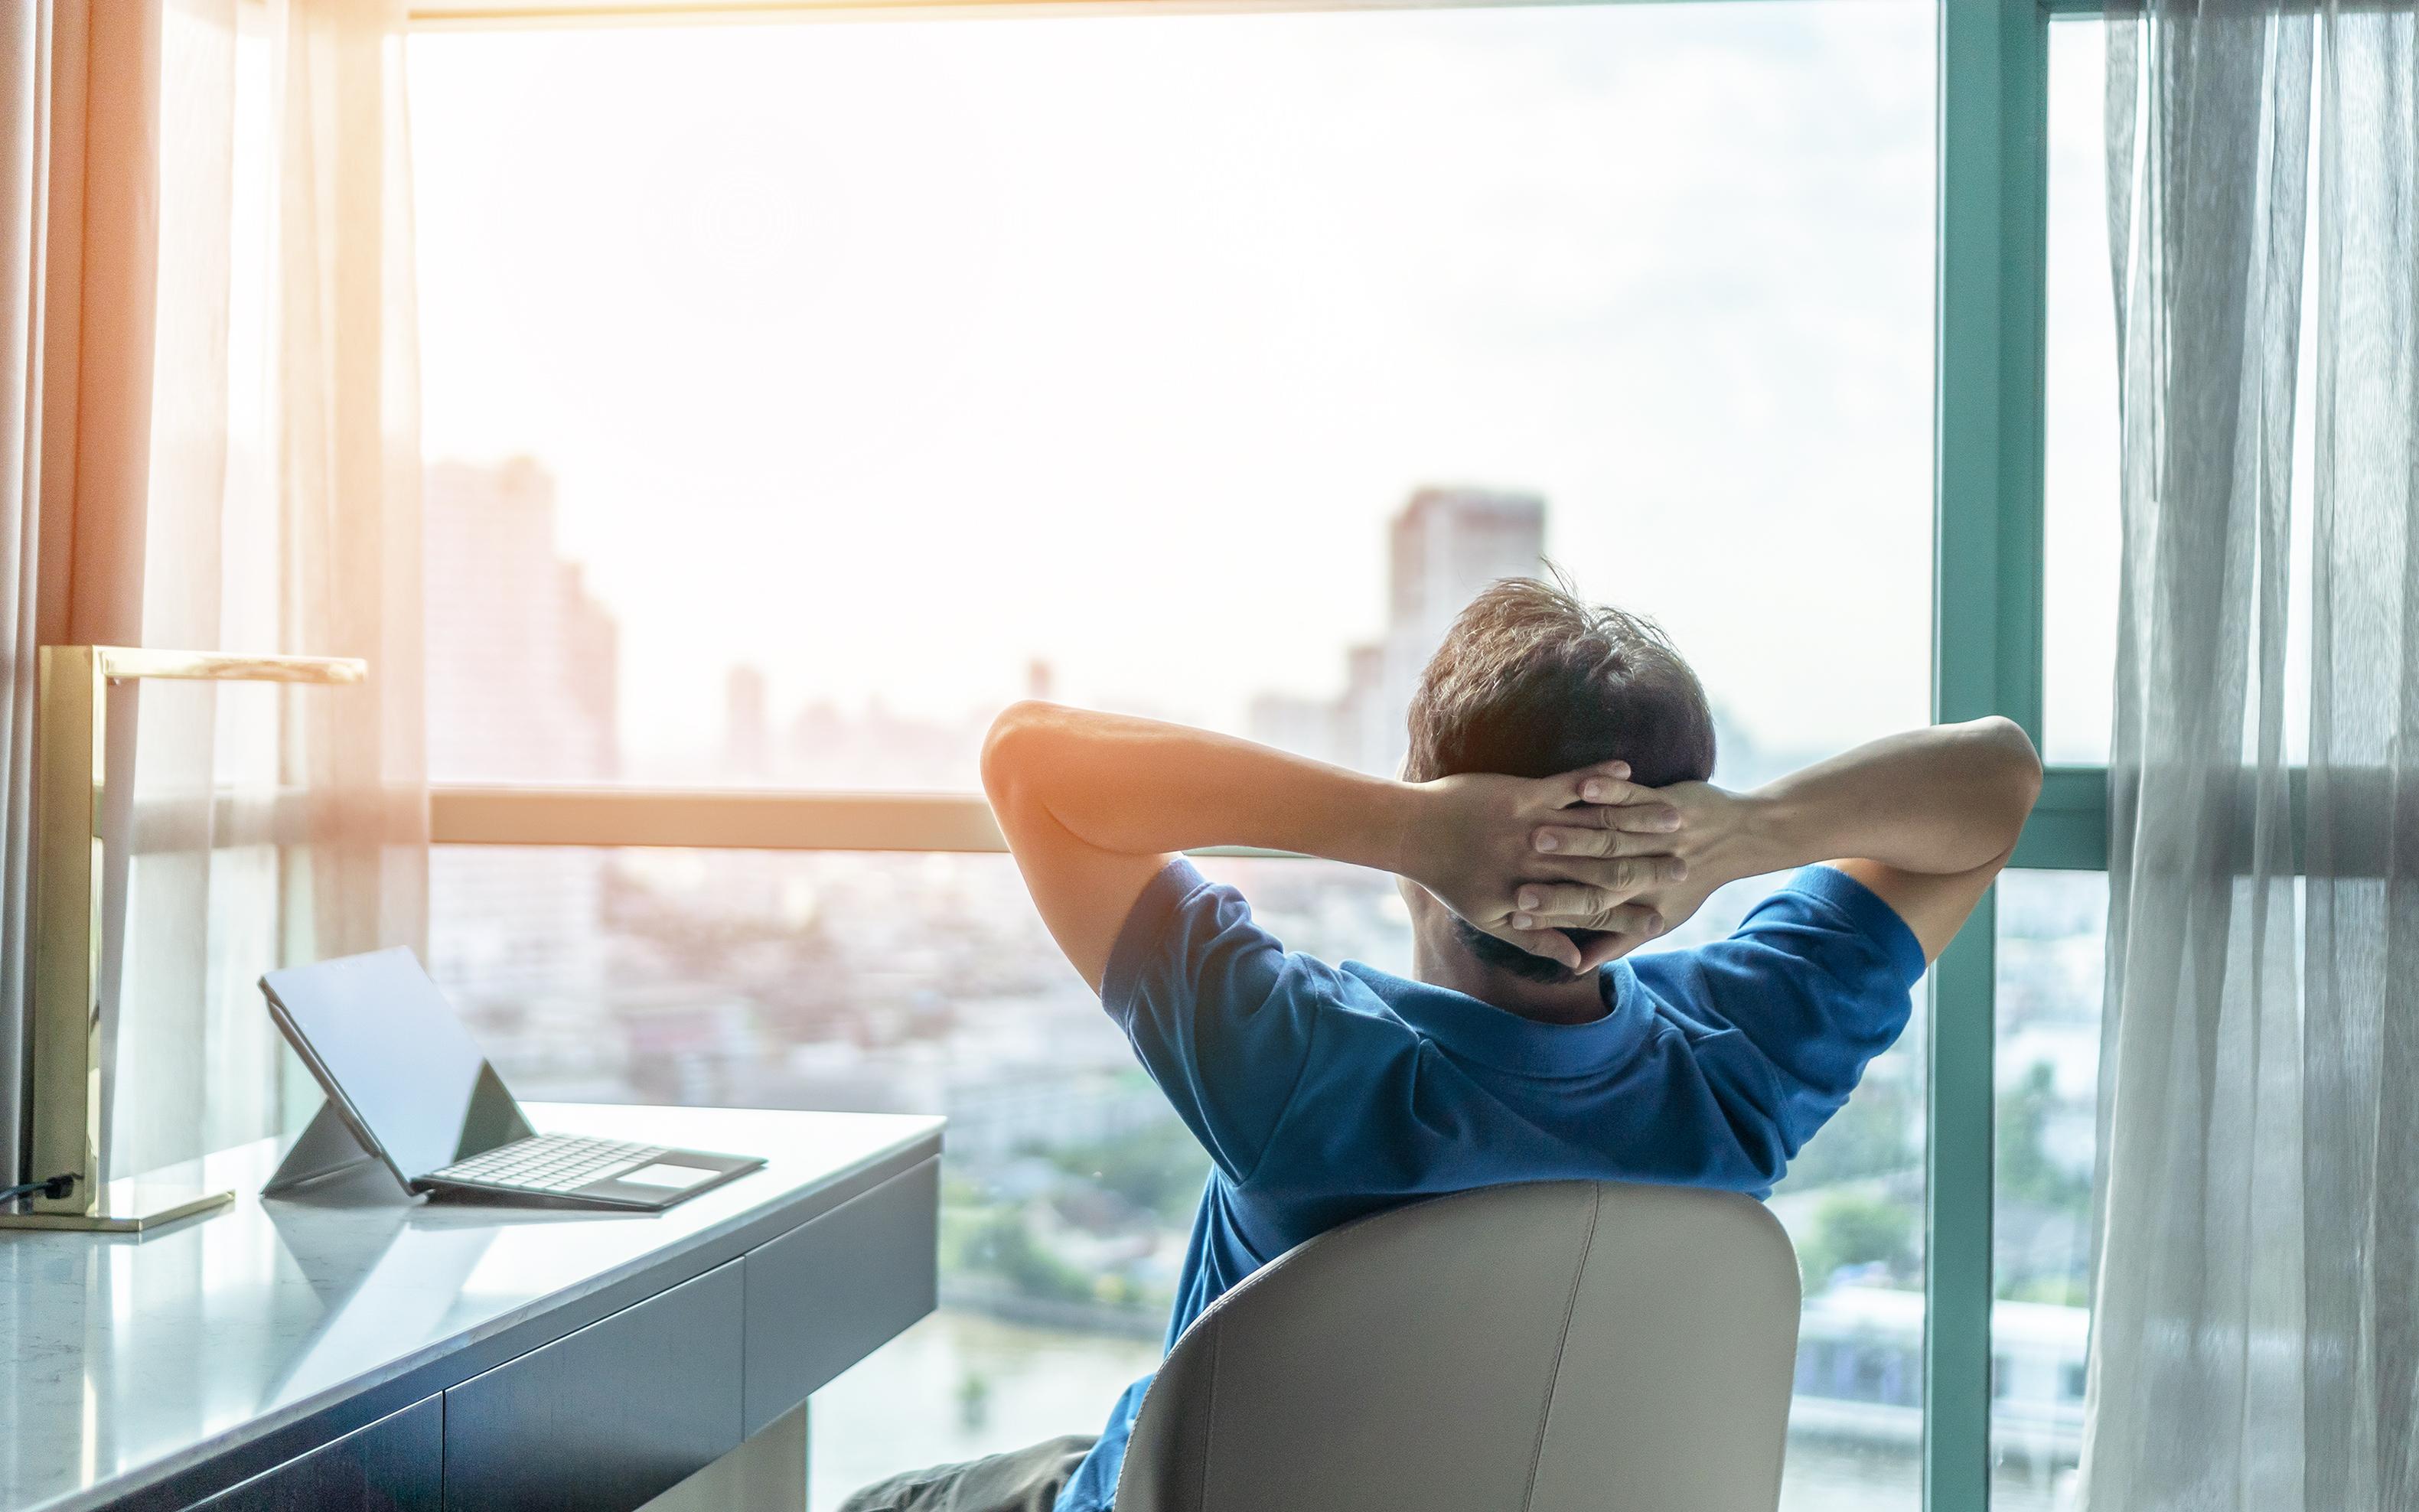 Five ways tech can help you achieve work-life balance